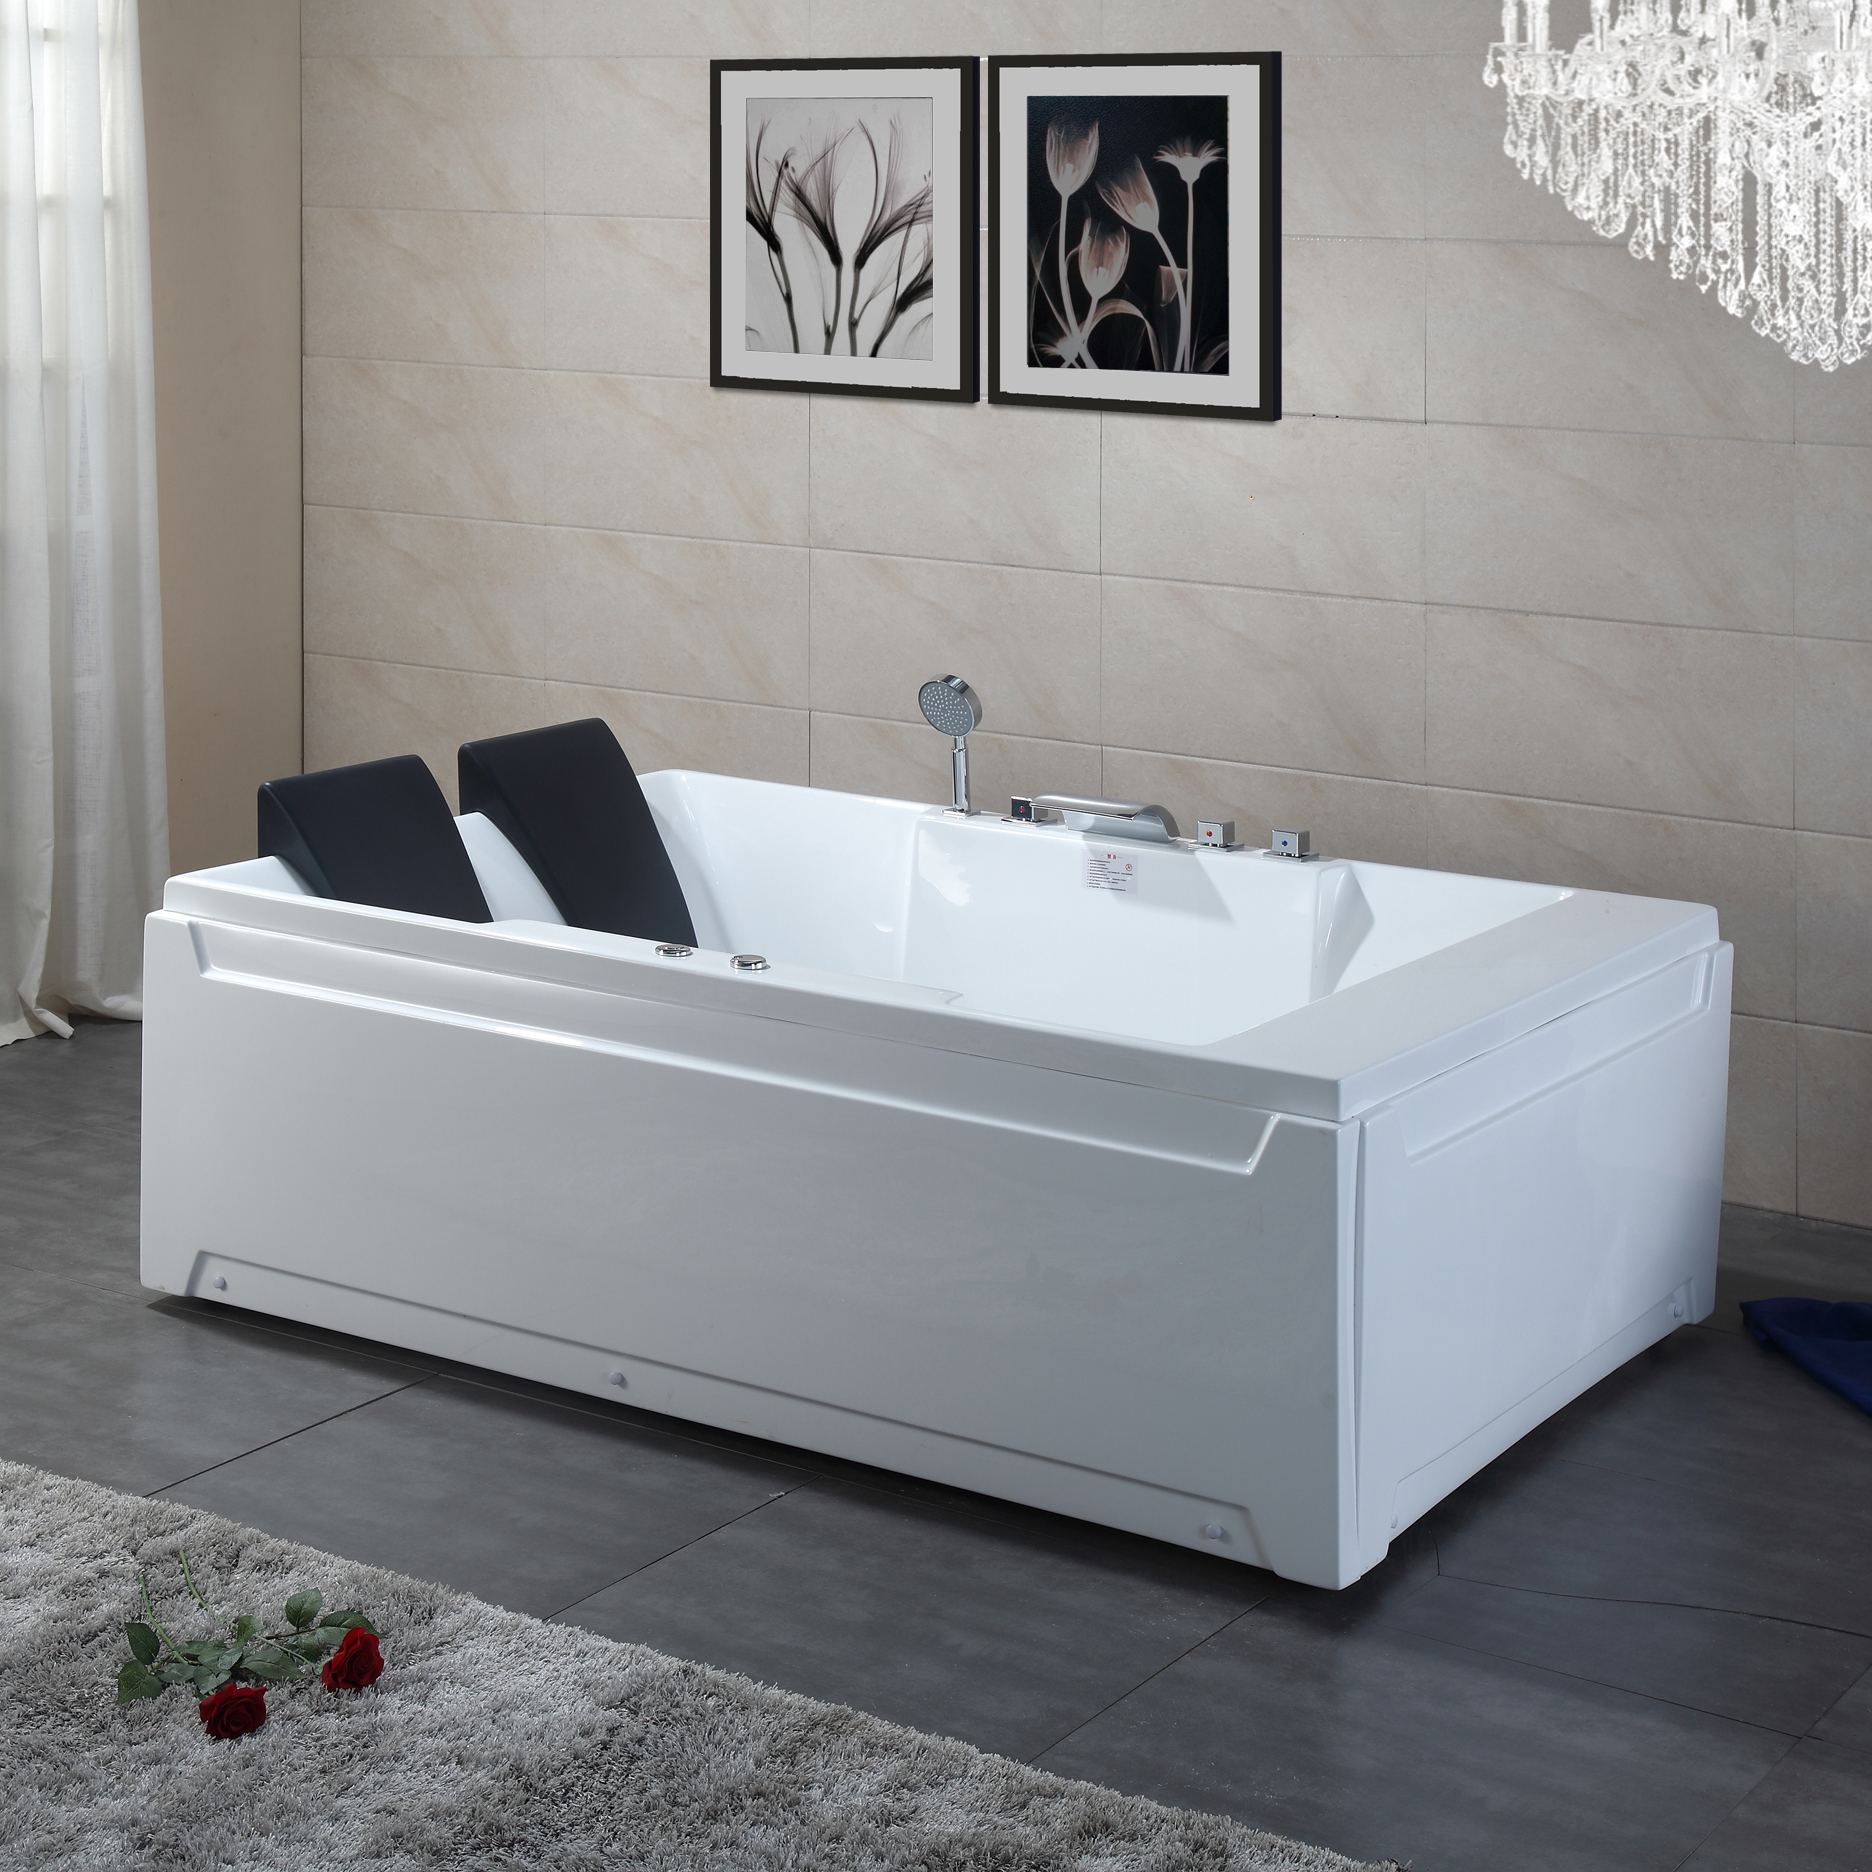 USD 107.50] Acrylic double surfing massage bathtub home mosaic into ...